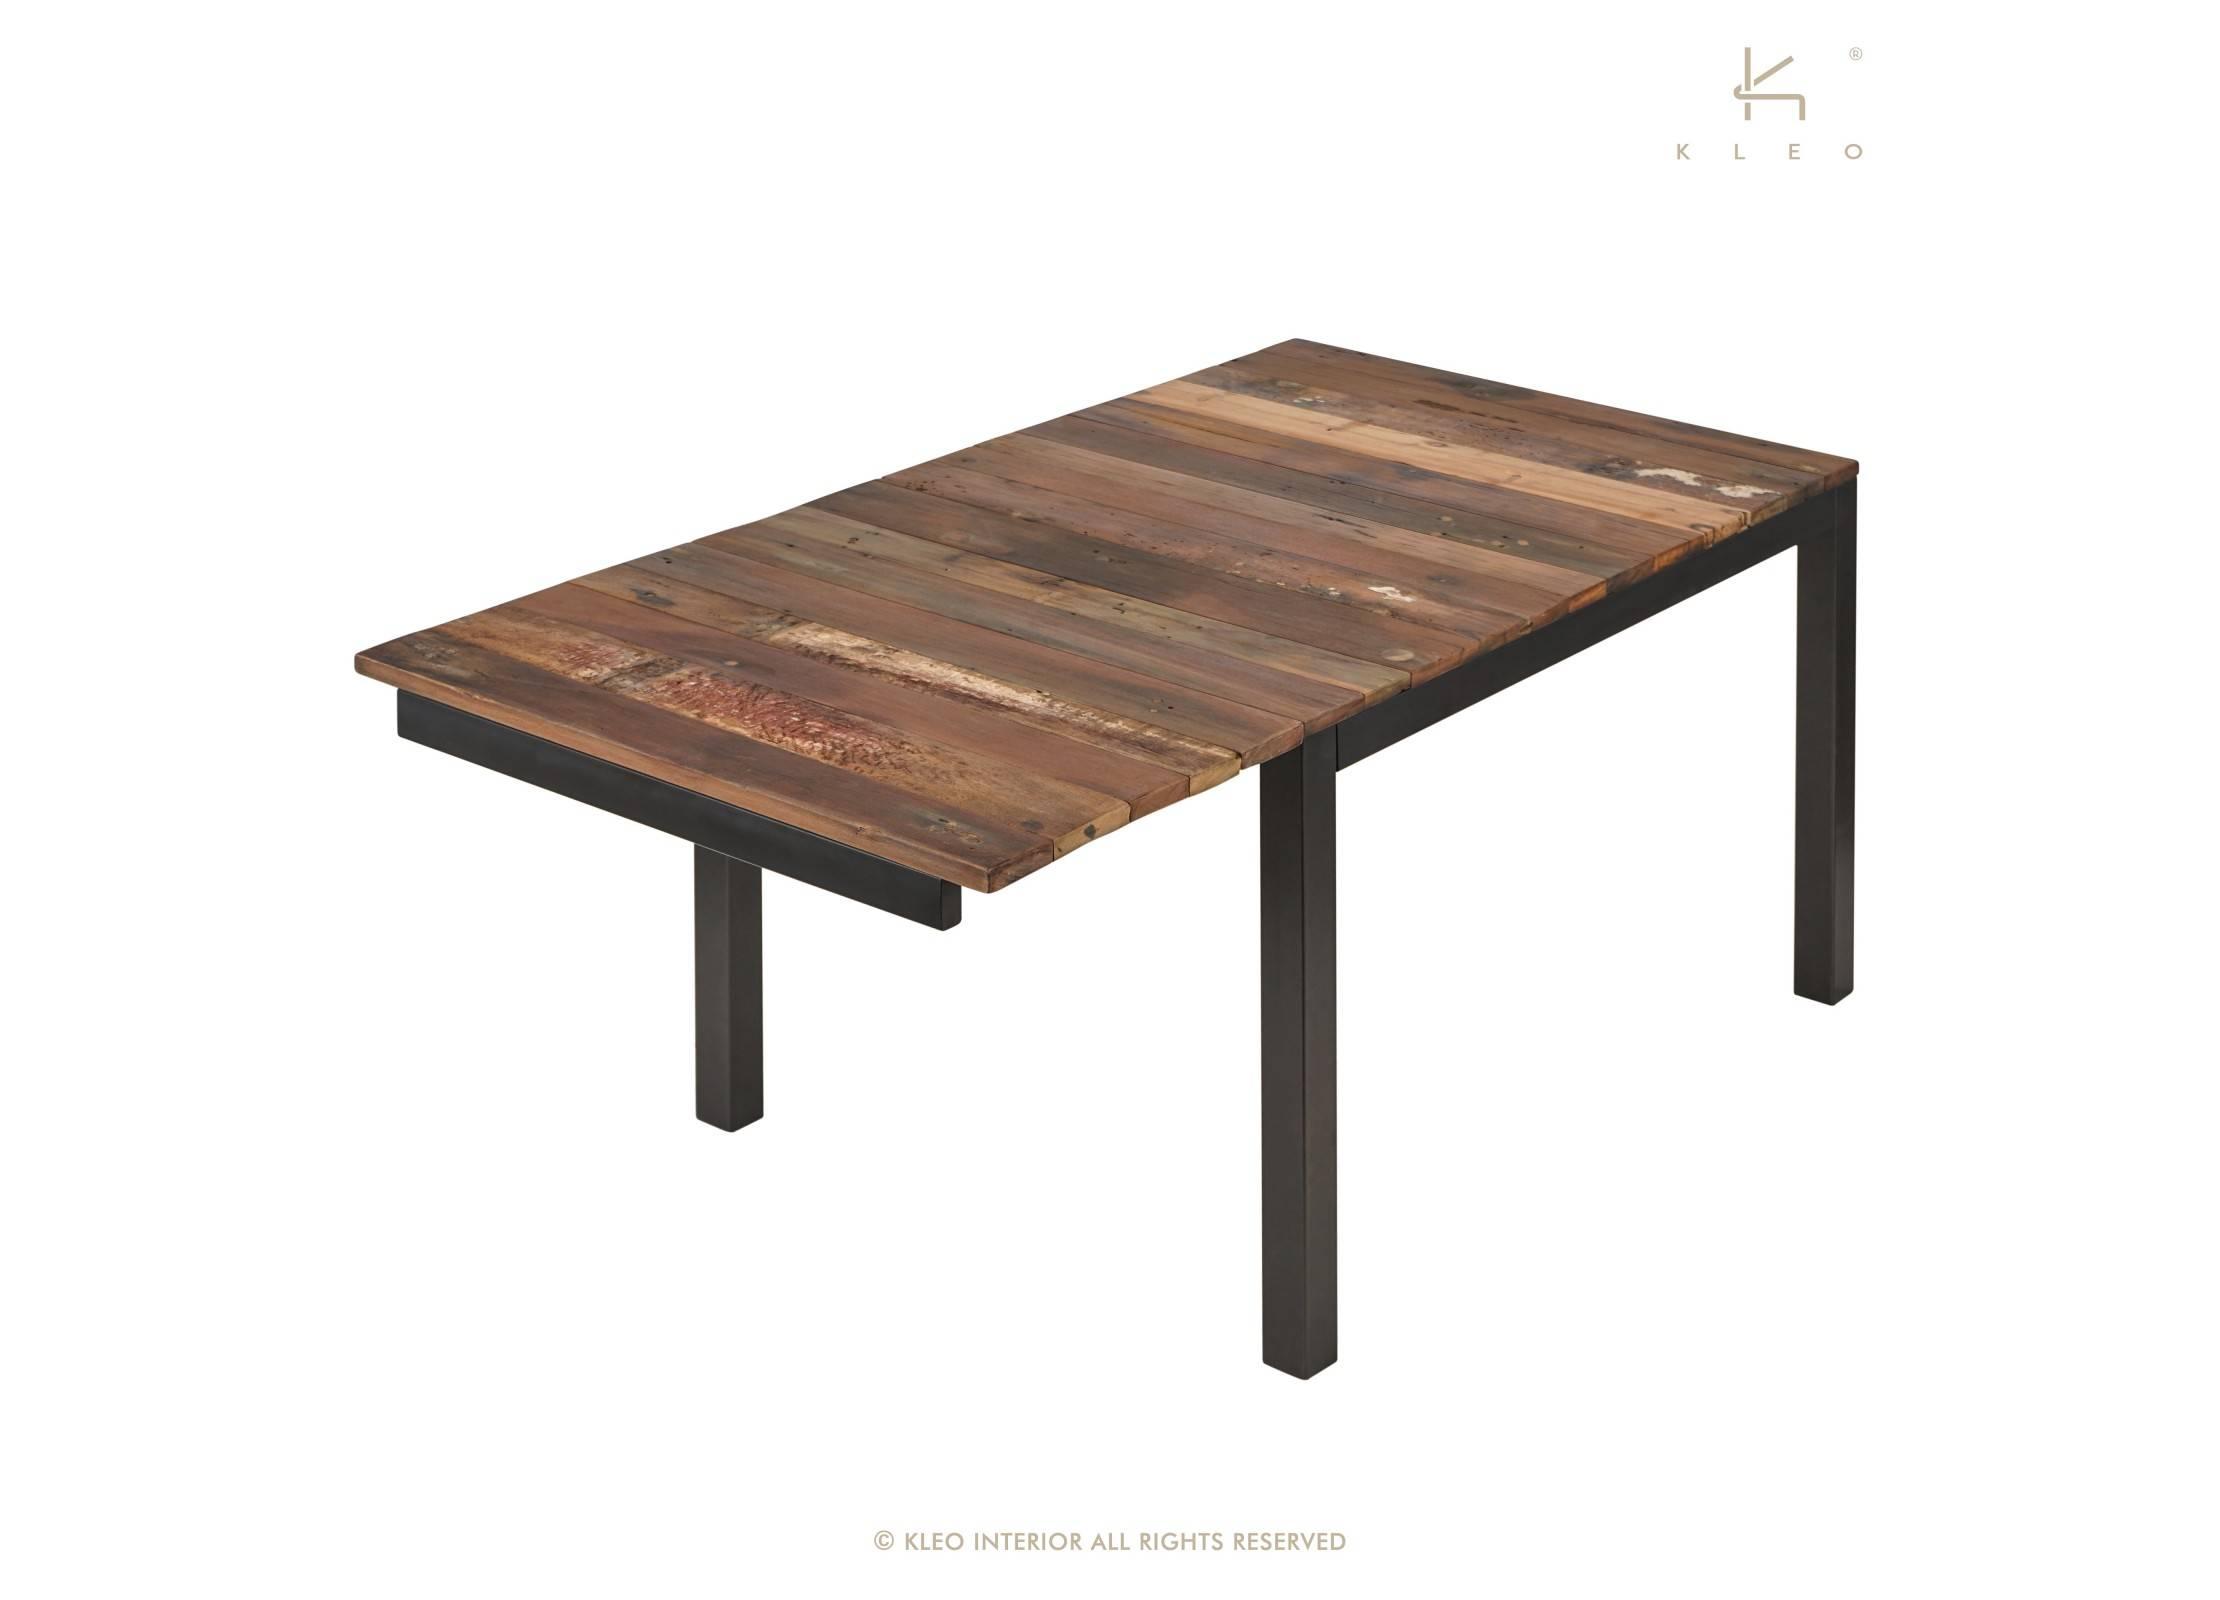 table manger rectangulaire extensible edito l120 170cm. Black Bedroom Furniture Sets. Home Design Ideas